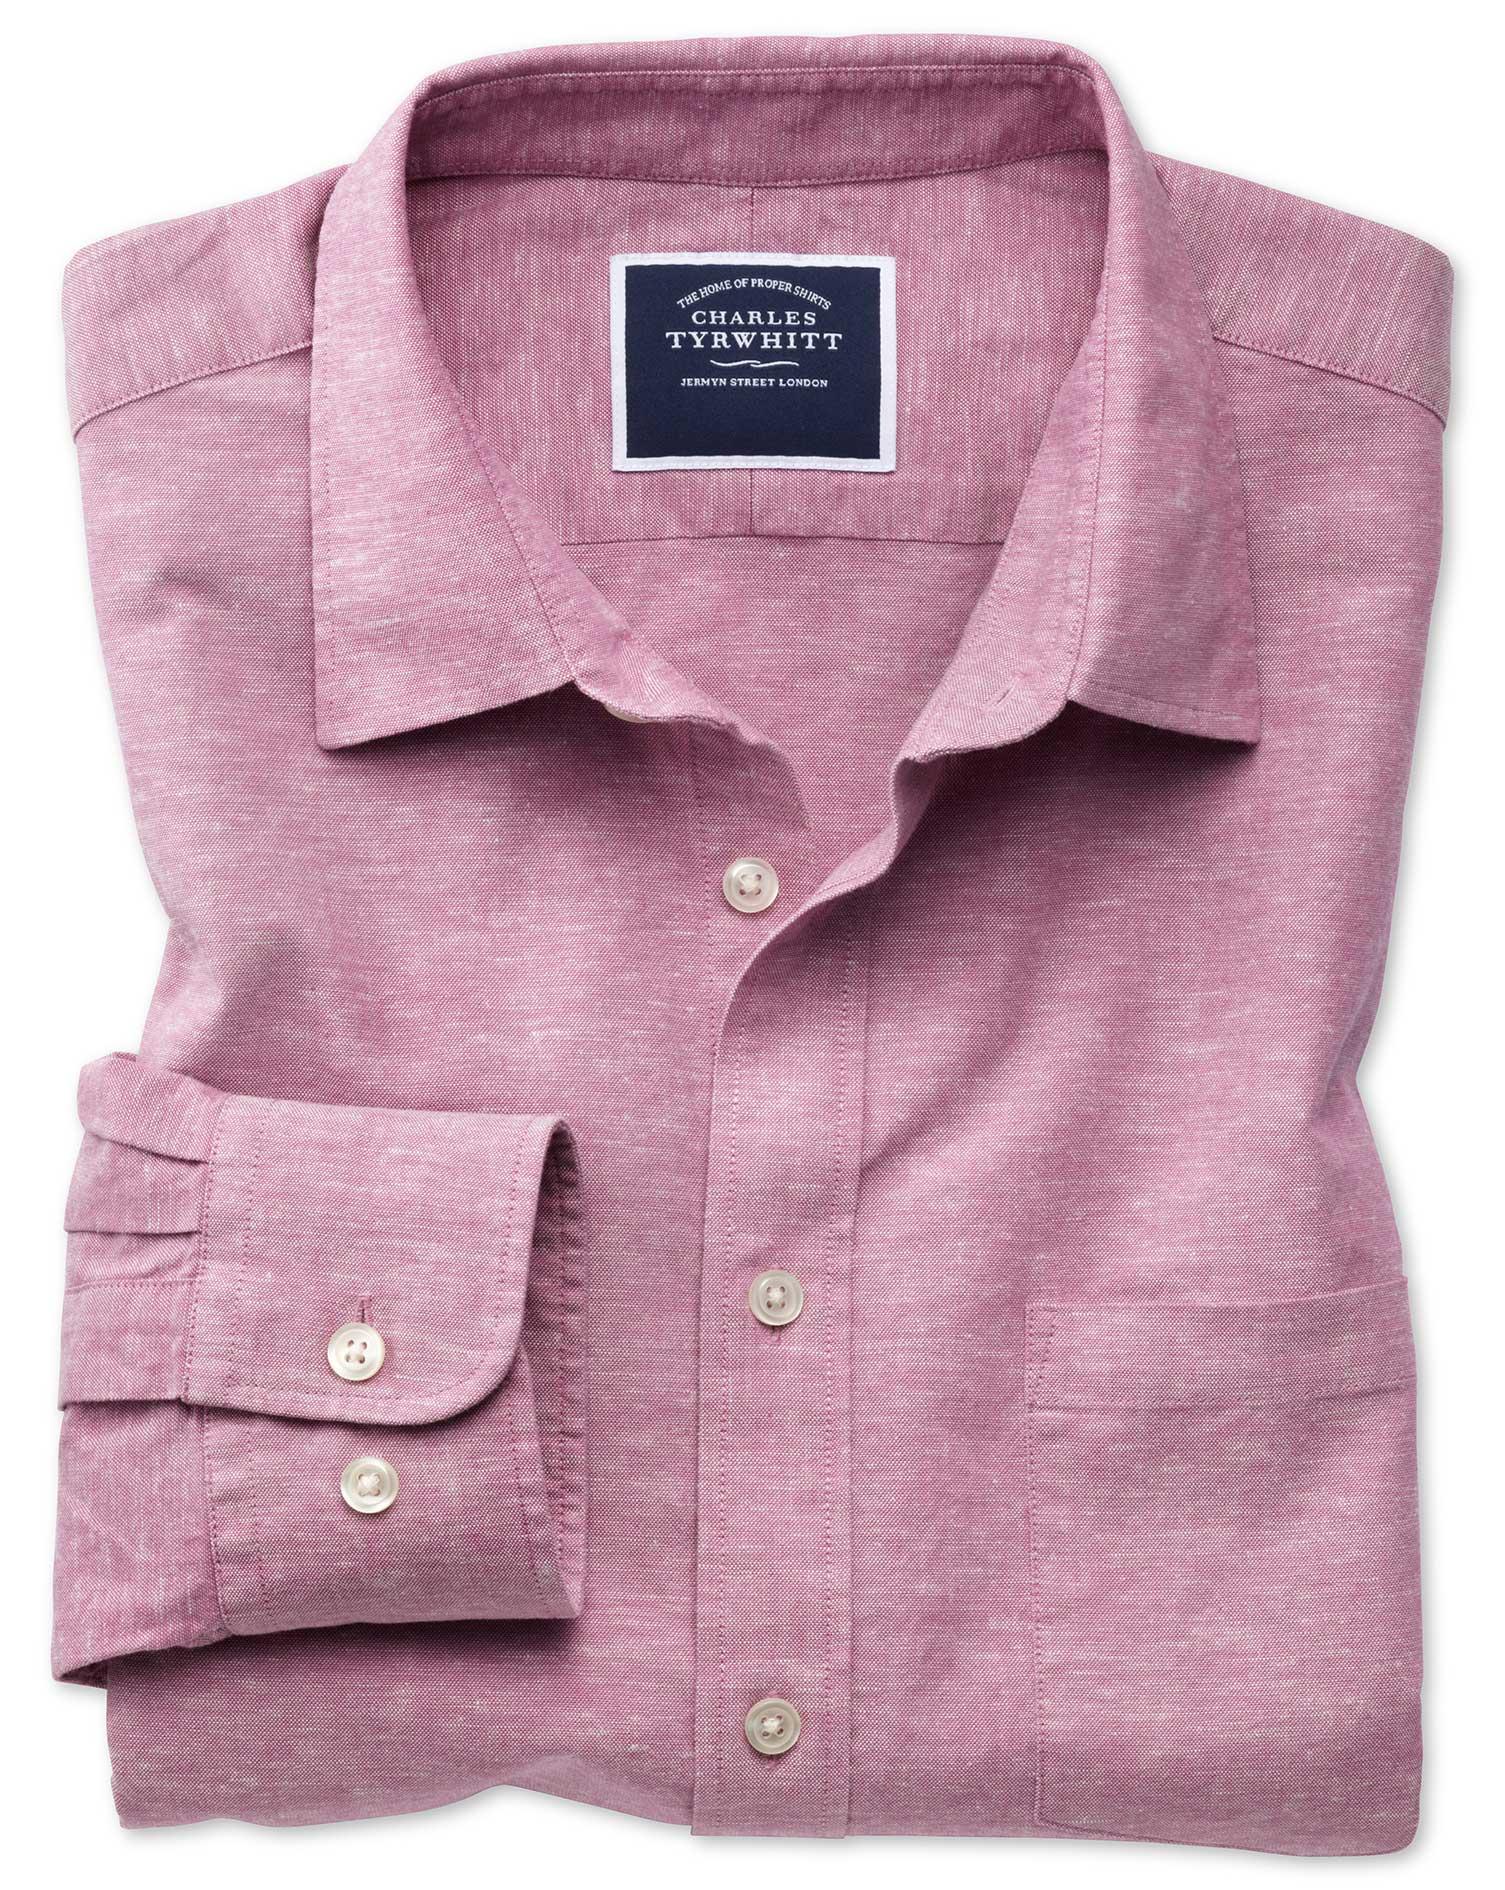 Classic Fit Cotton Linen Pink Plain Shirt Single Cuff Size Medium by Charles Tyrwhitt